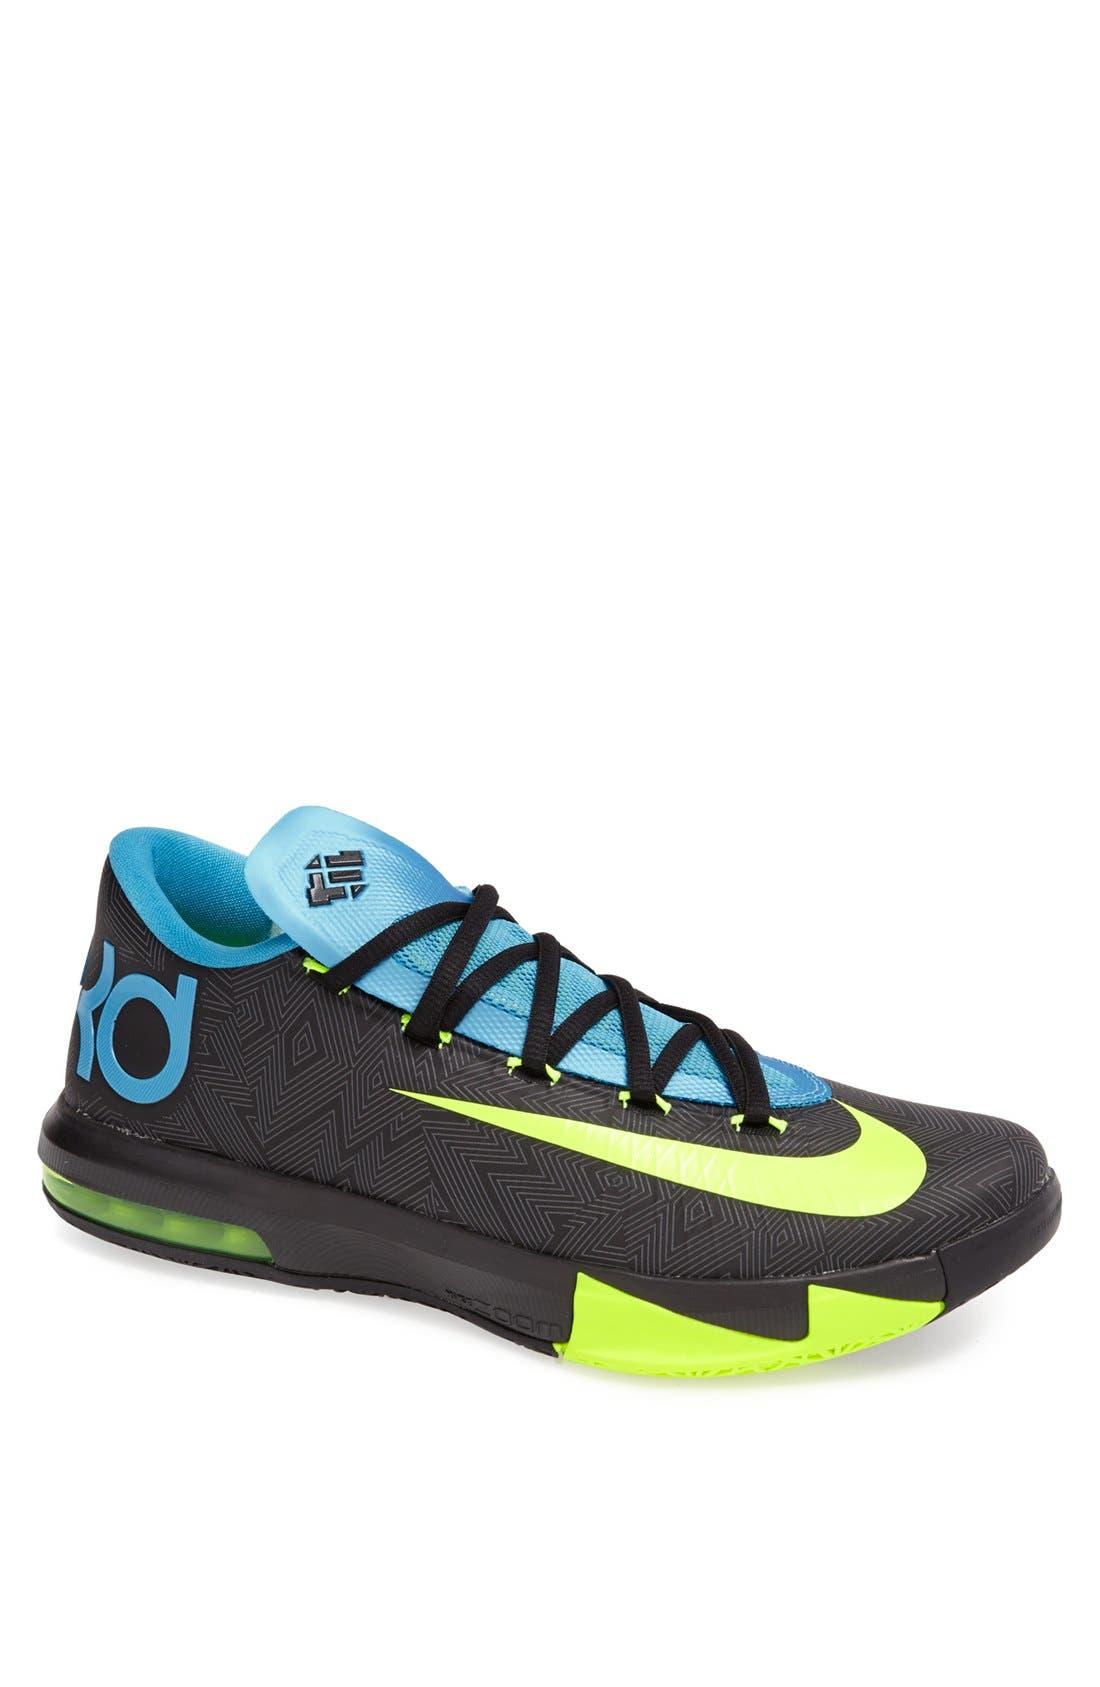 Alternate Image 1 Selected - Nike 'KD VI' Basketball Shoe (Men)